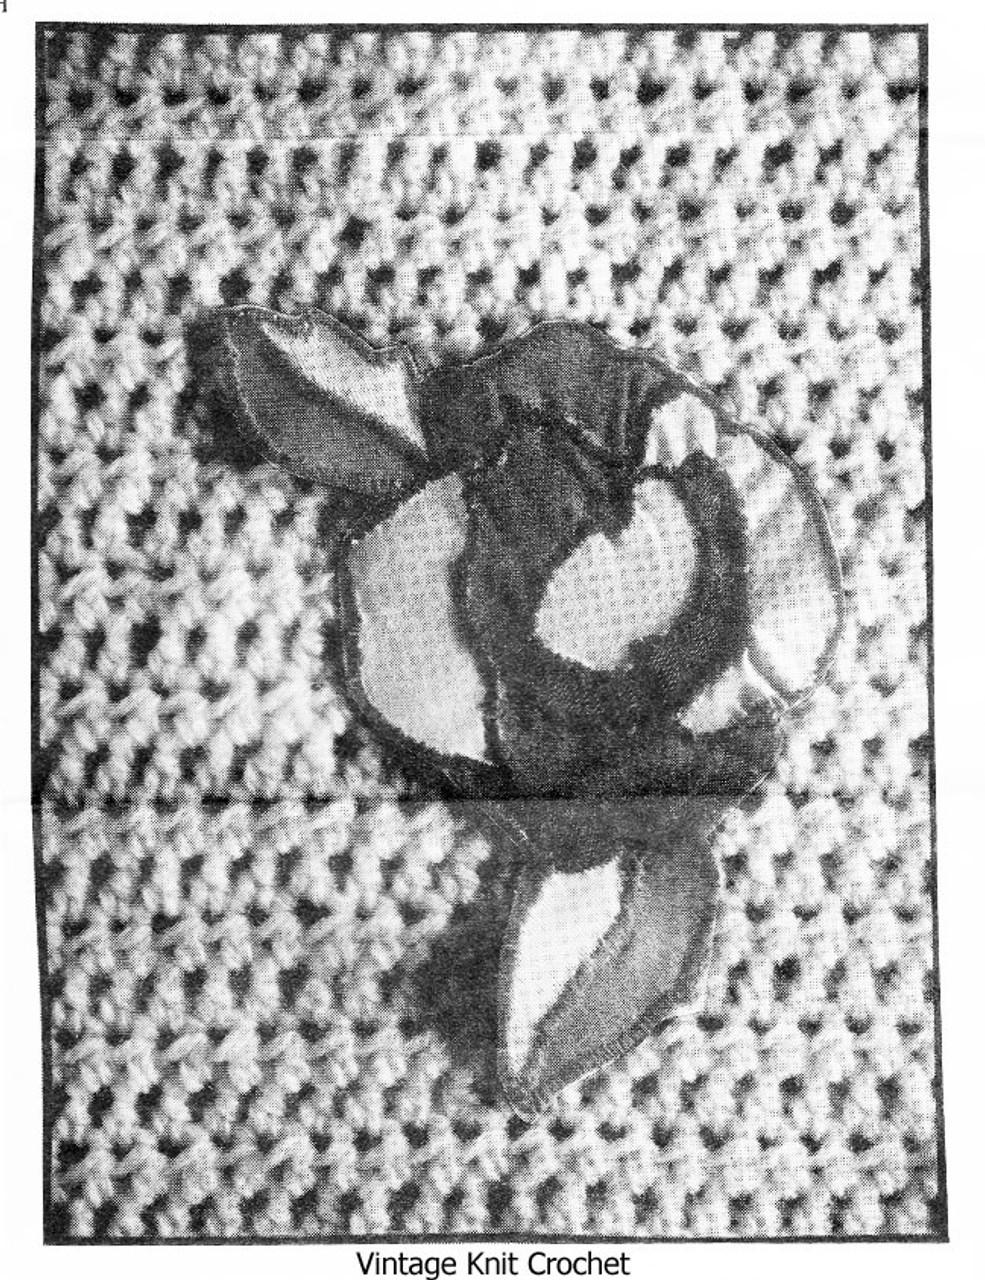 Rose Applique on Crochet Pullover Illustration, Alice Brooks 7175